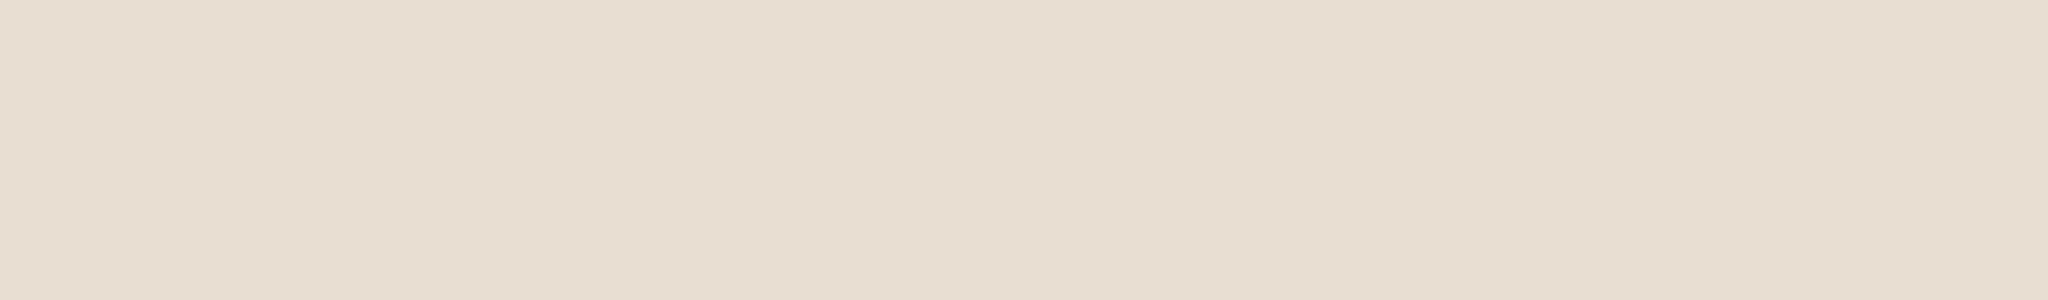 HU 12177 ABS hrana béžová malaga hladká lesk 90°